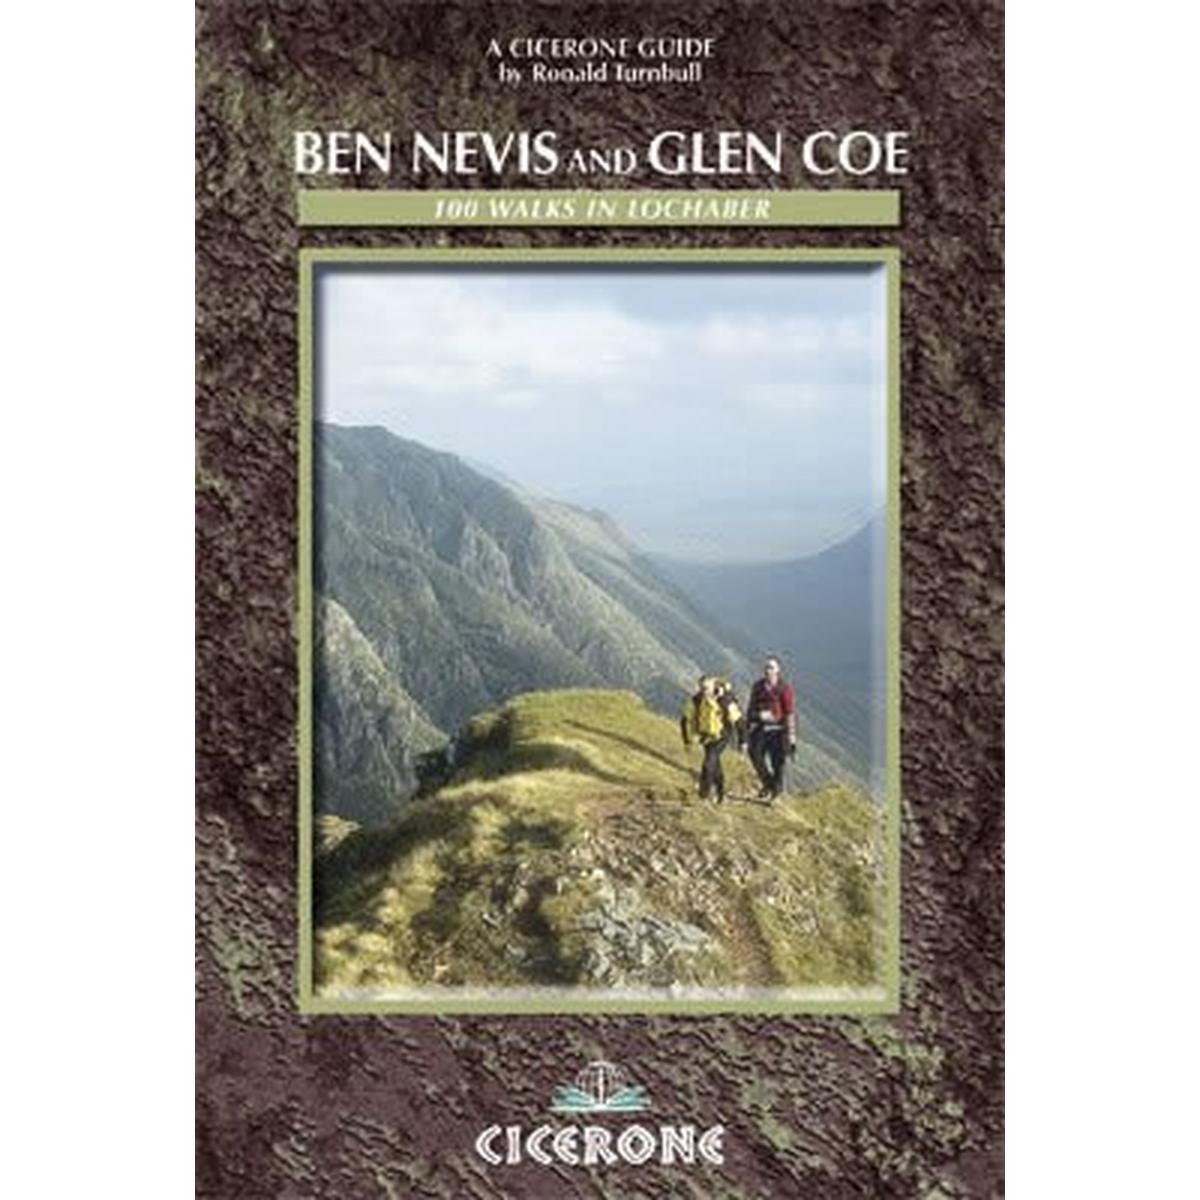 Cicerone Guidebook: Ben Nevis and Glen Coe